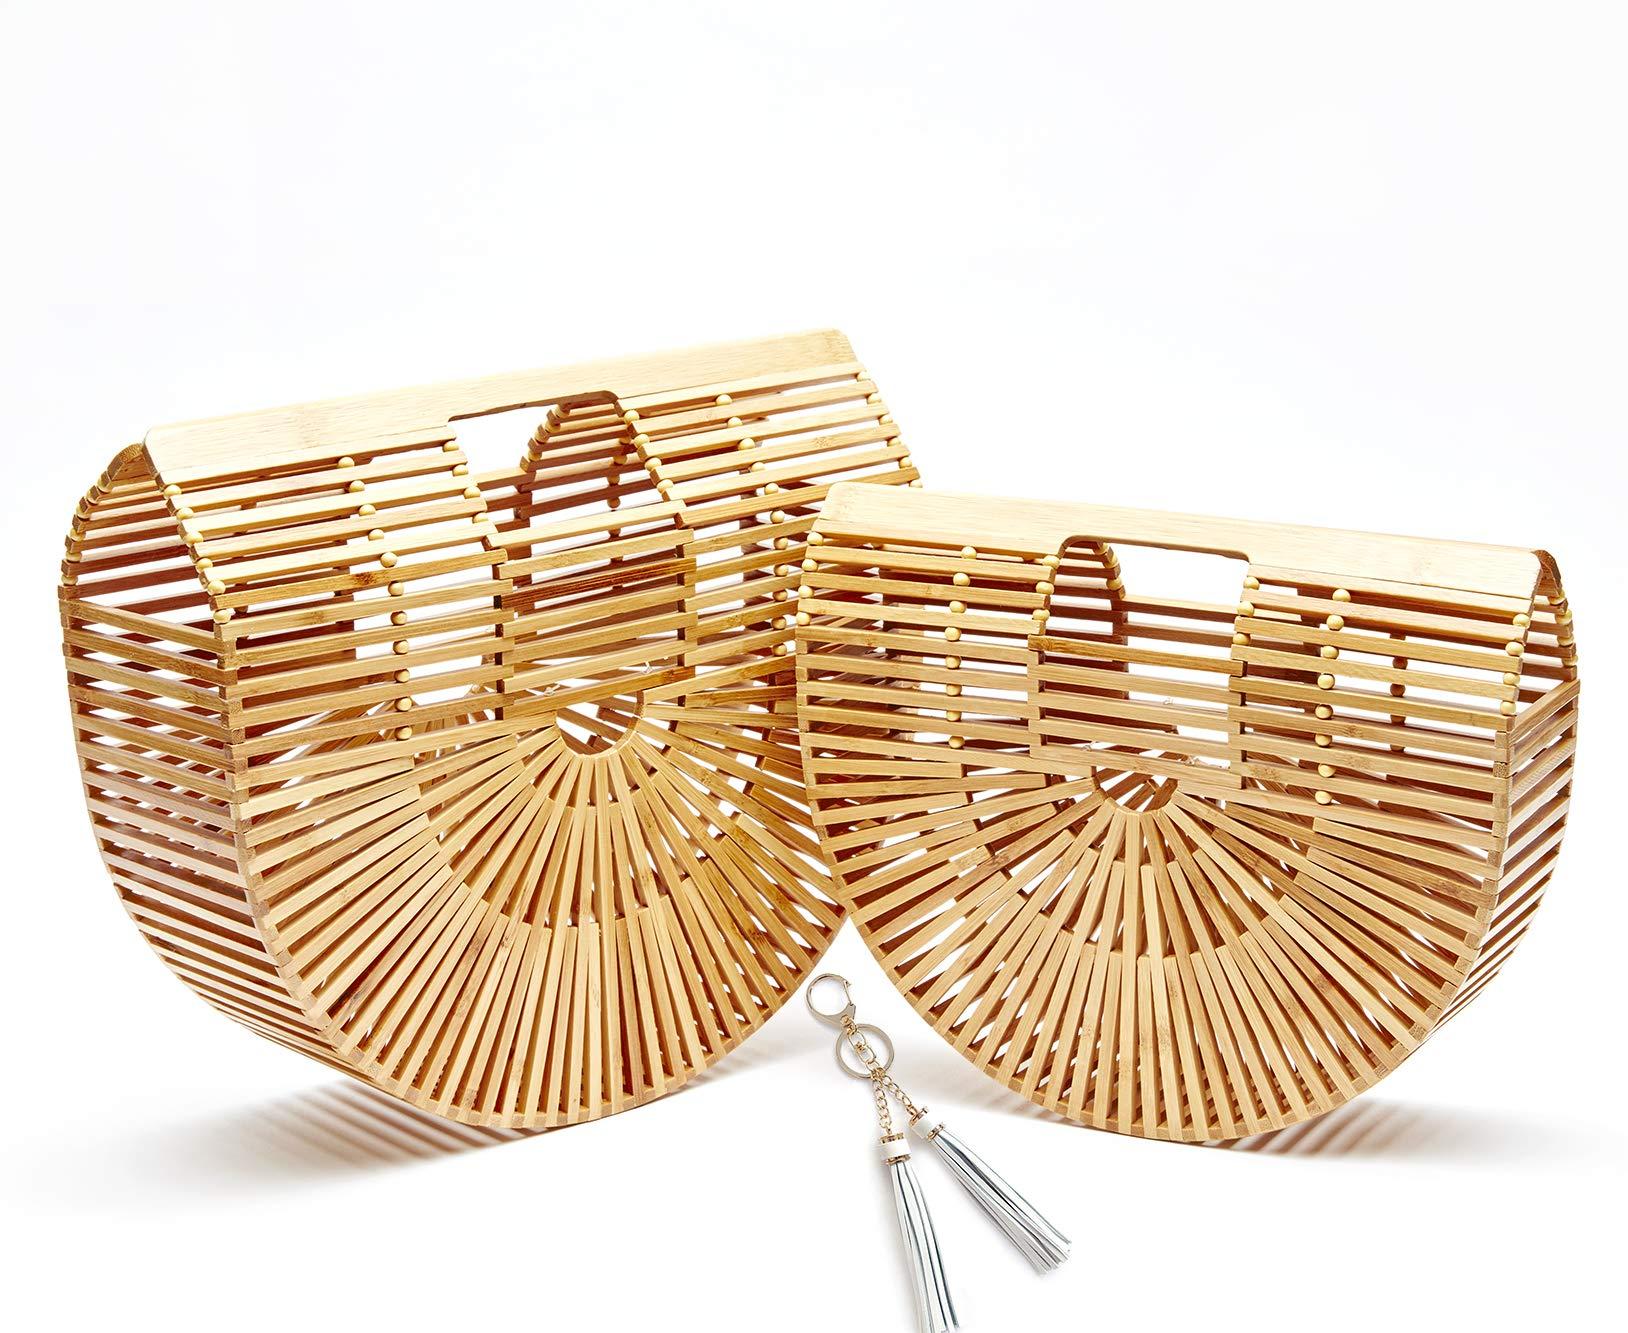 Oicoo Bamboo Bag (Large)